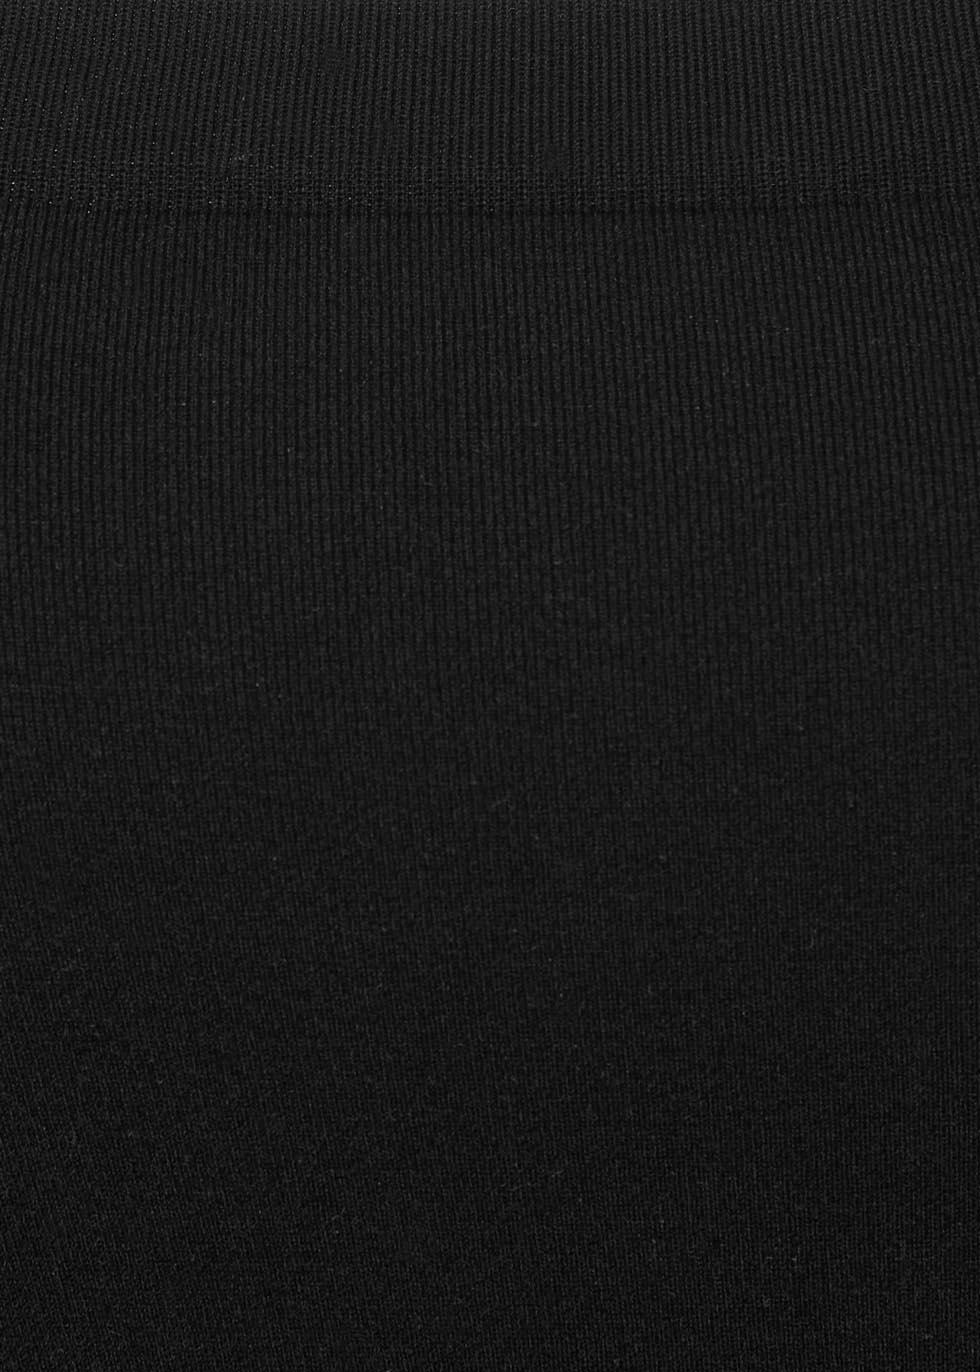 Fatal black stretch jersey dress - Wolford